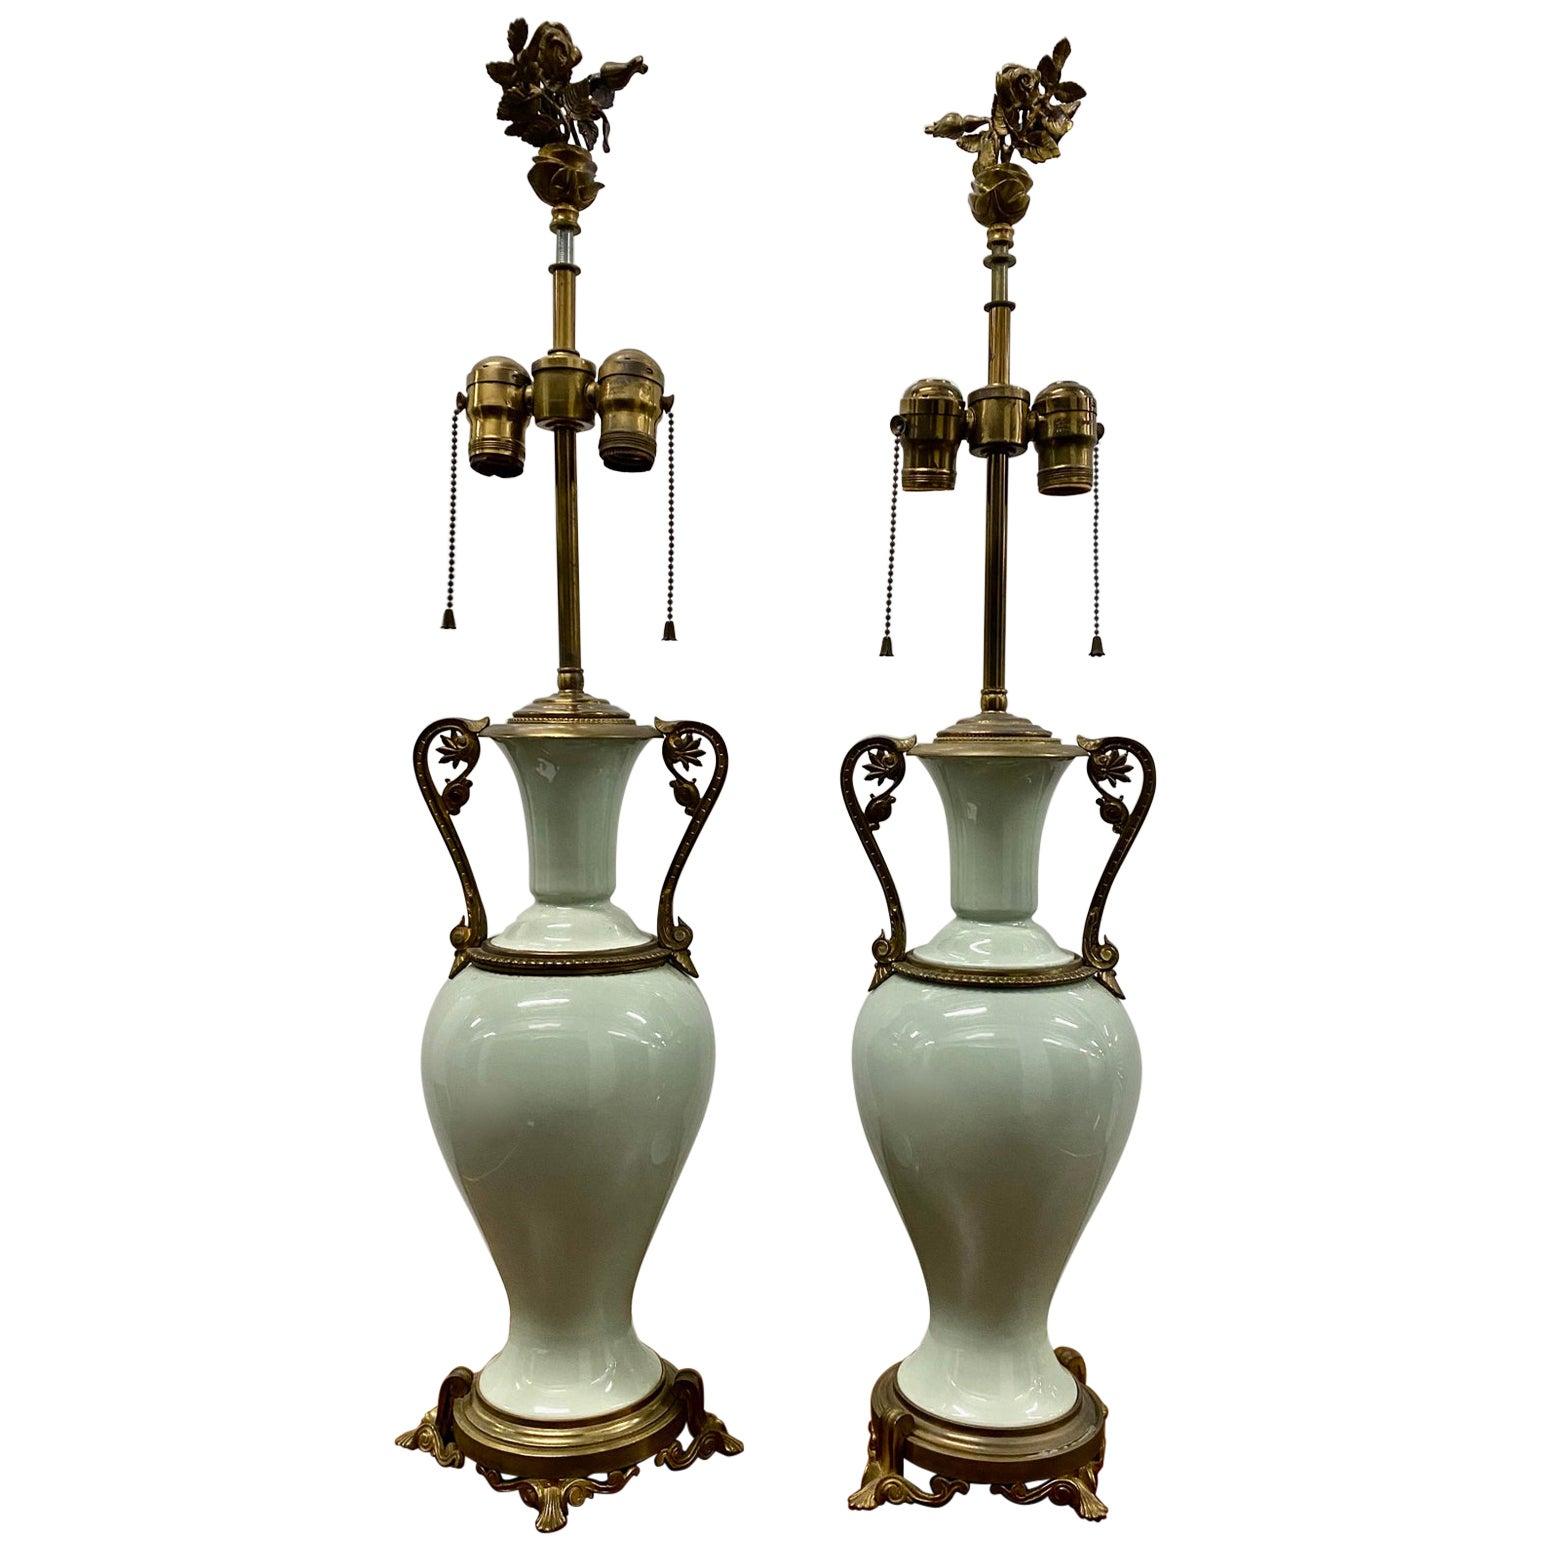 Pair of Elegant Sage Green Porcelain Table Lamps with Ormolu Mounts, circa 1940